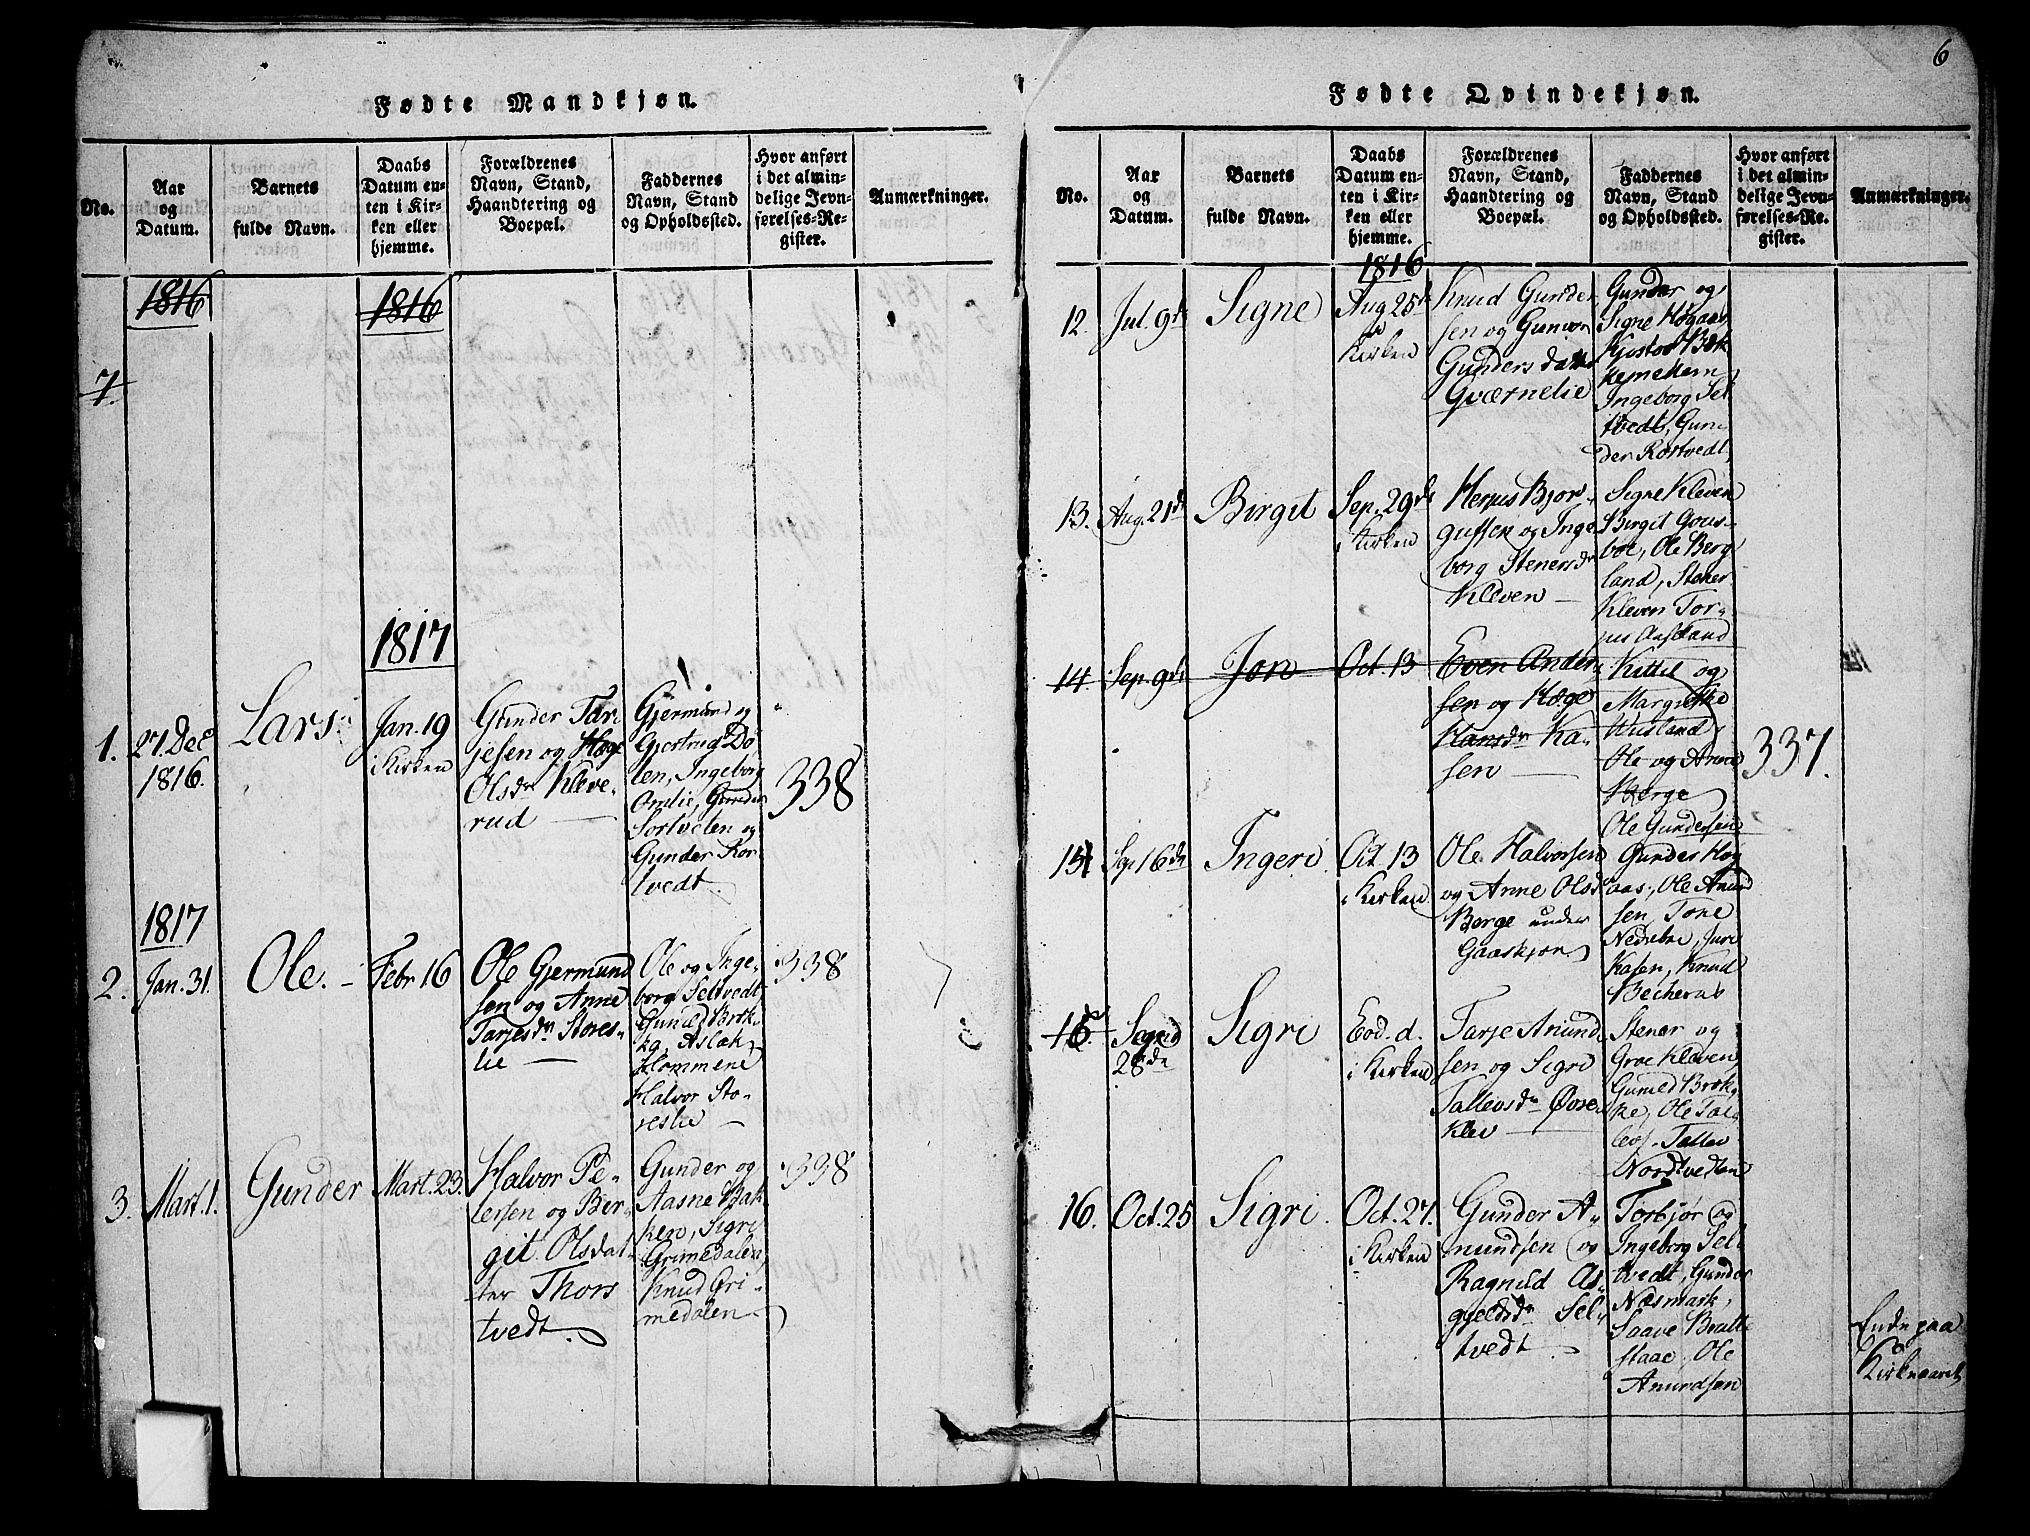 SAKO, Mo kirkebøker, F/Fb/L0001: Ministerialbok nr. II 1, 1814-1844, s. 6